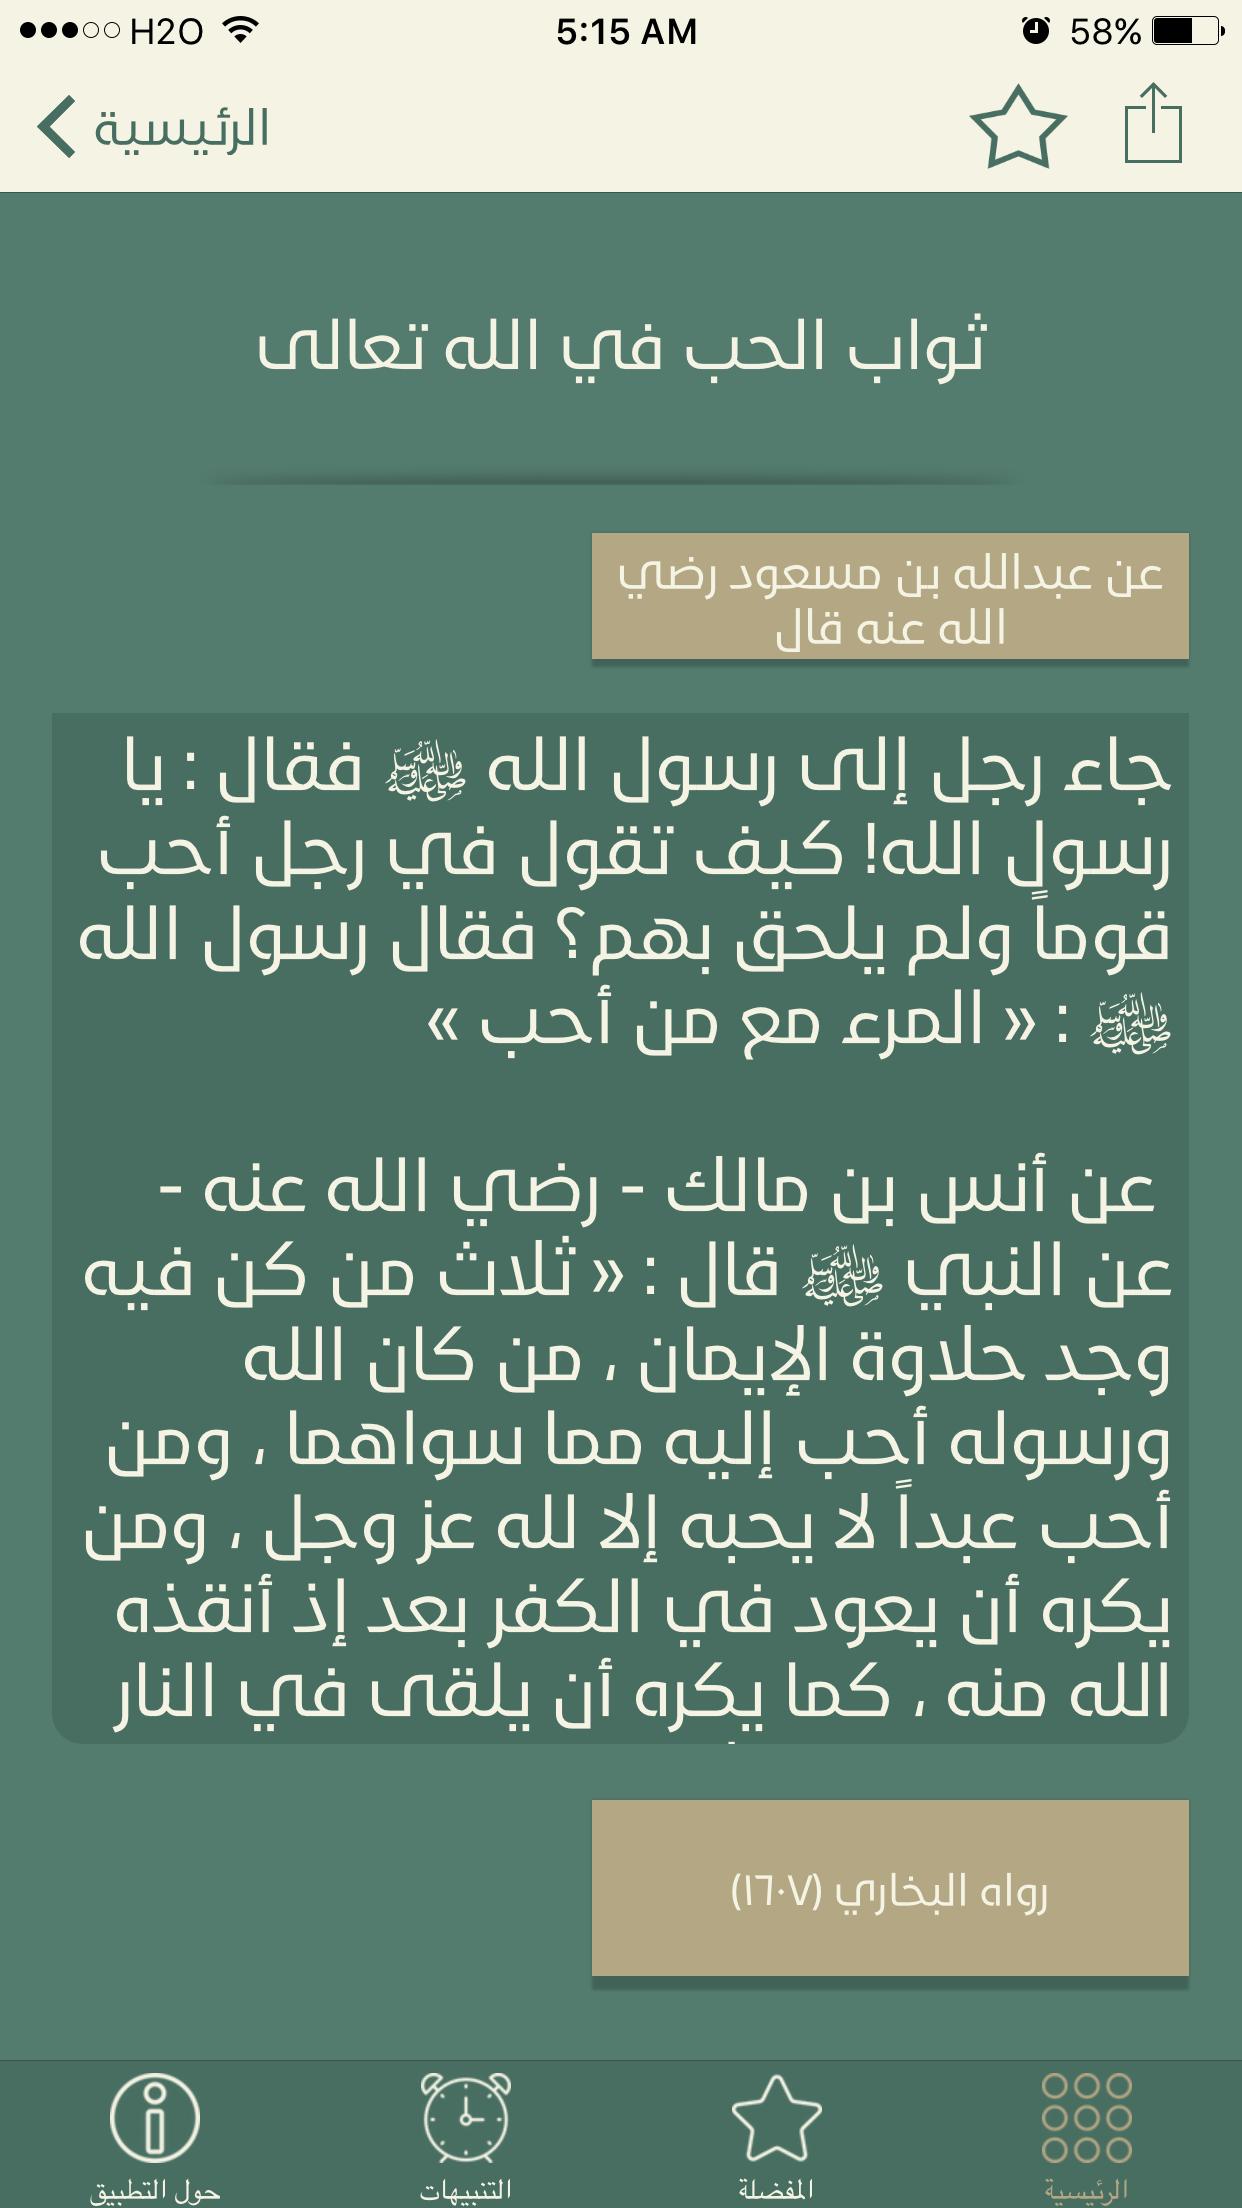 Pin By Fatima Rached On اسلامislam Allly Lockscreen Lockscreen Screenshot